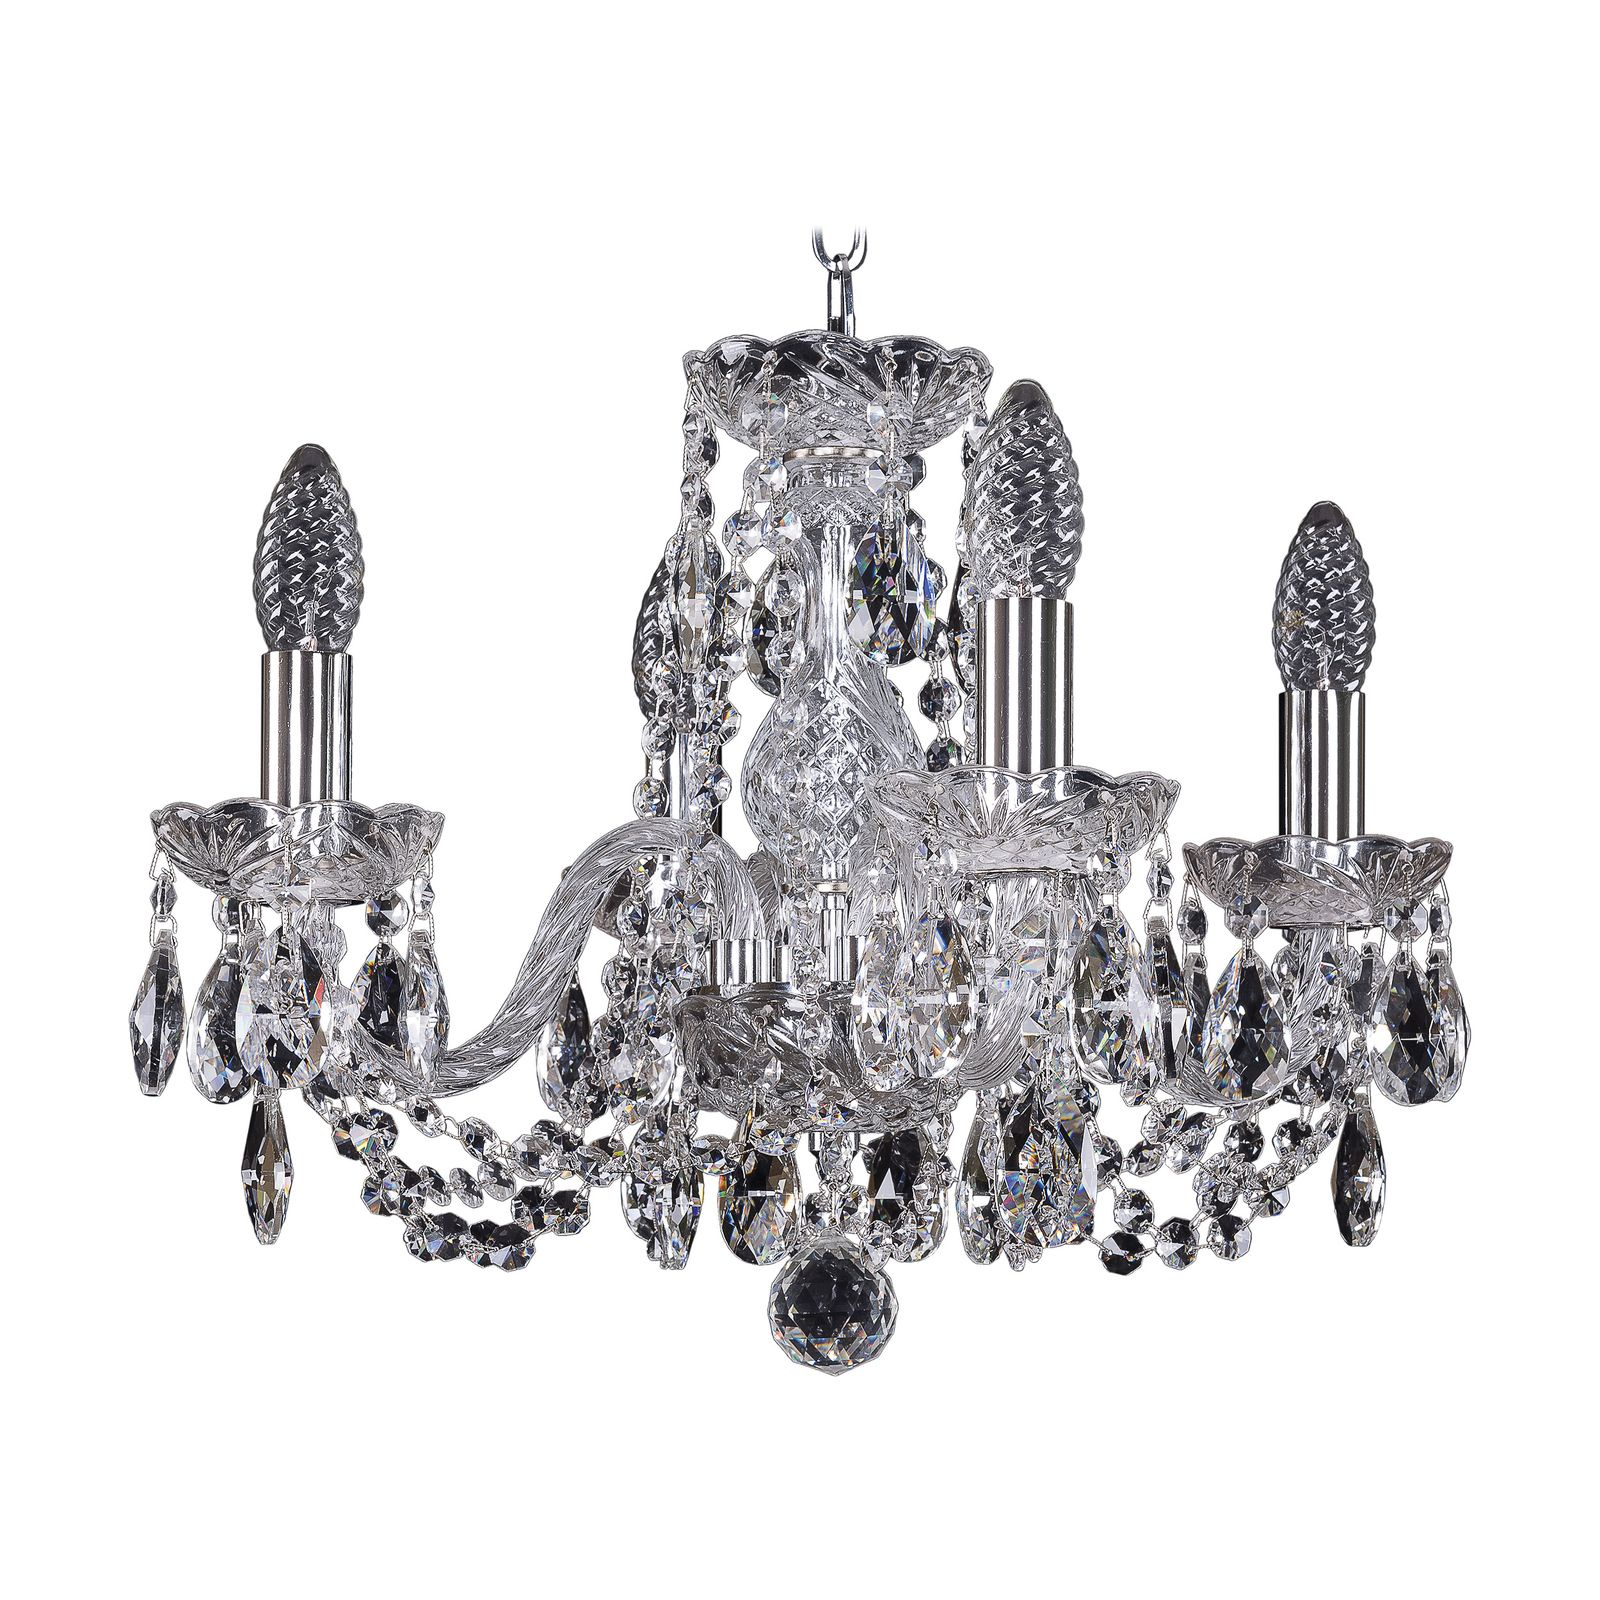 все цены на Подвесной светильник Bohemia Ivele Crystal 1402/4/141 Ni, E14, 40 Вт онлайн